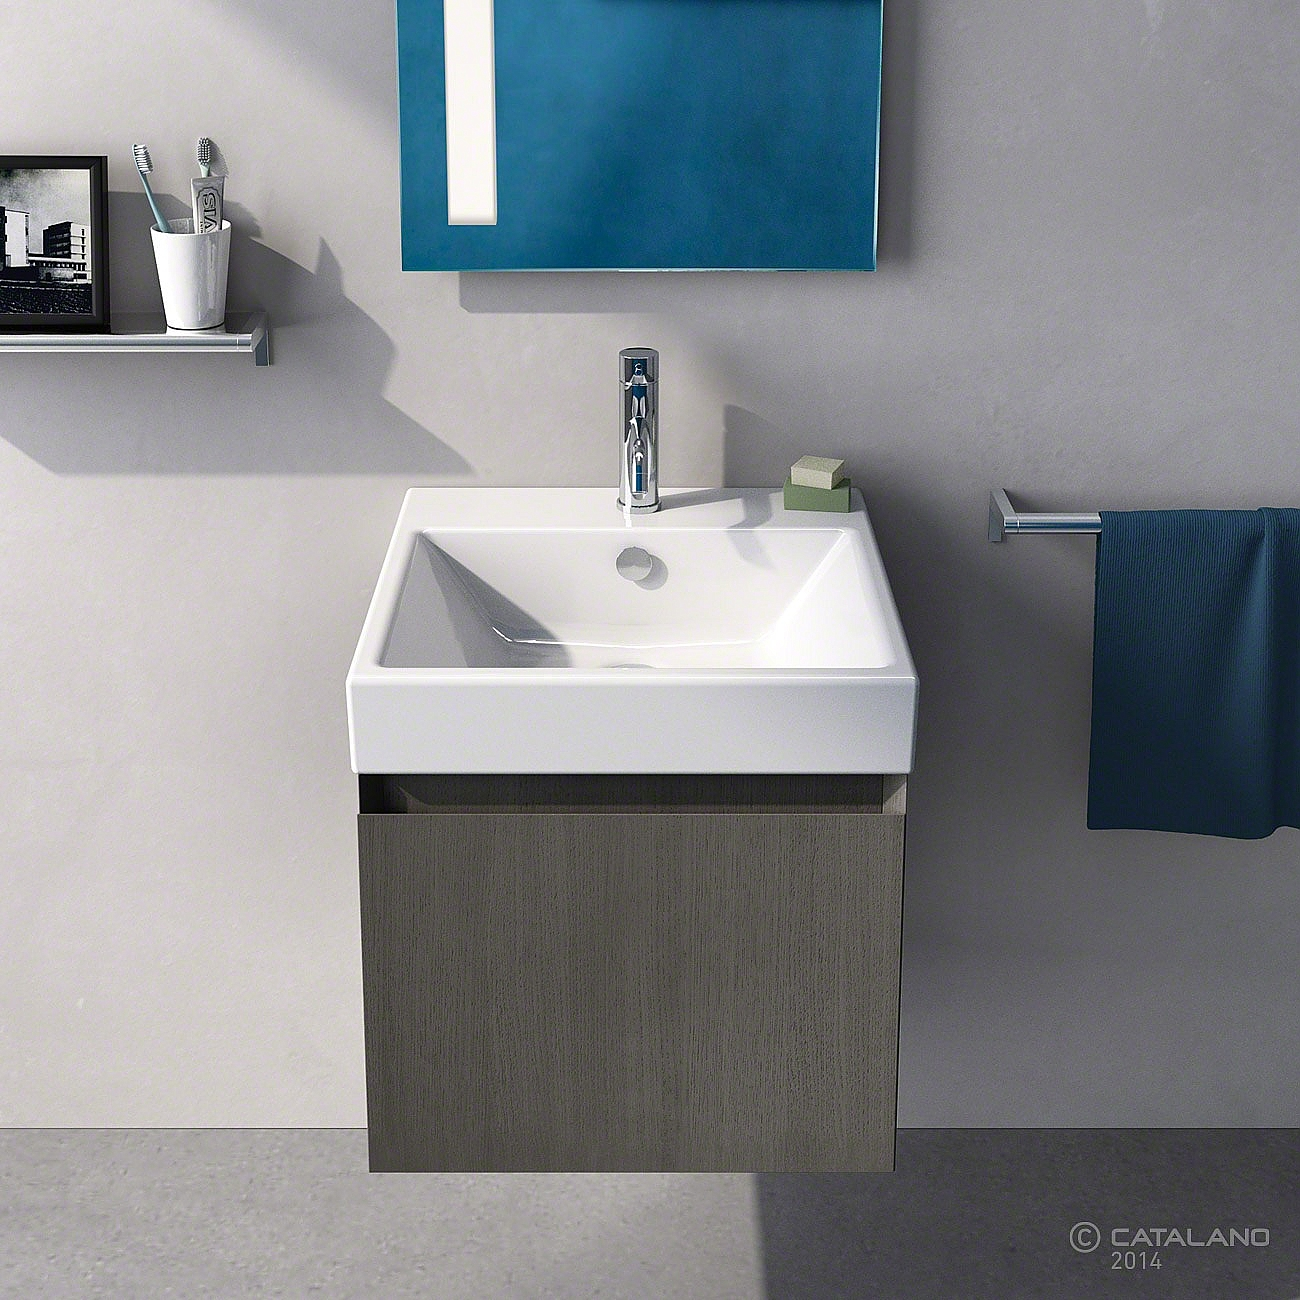 catalano zero wastafel 50x50cm wit 15qze00. Black Bedroom Furniture Sets. Home Design Ideas